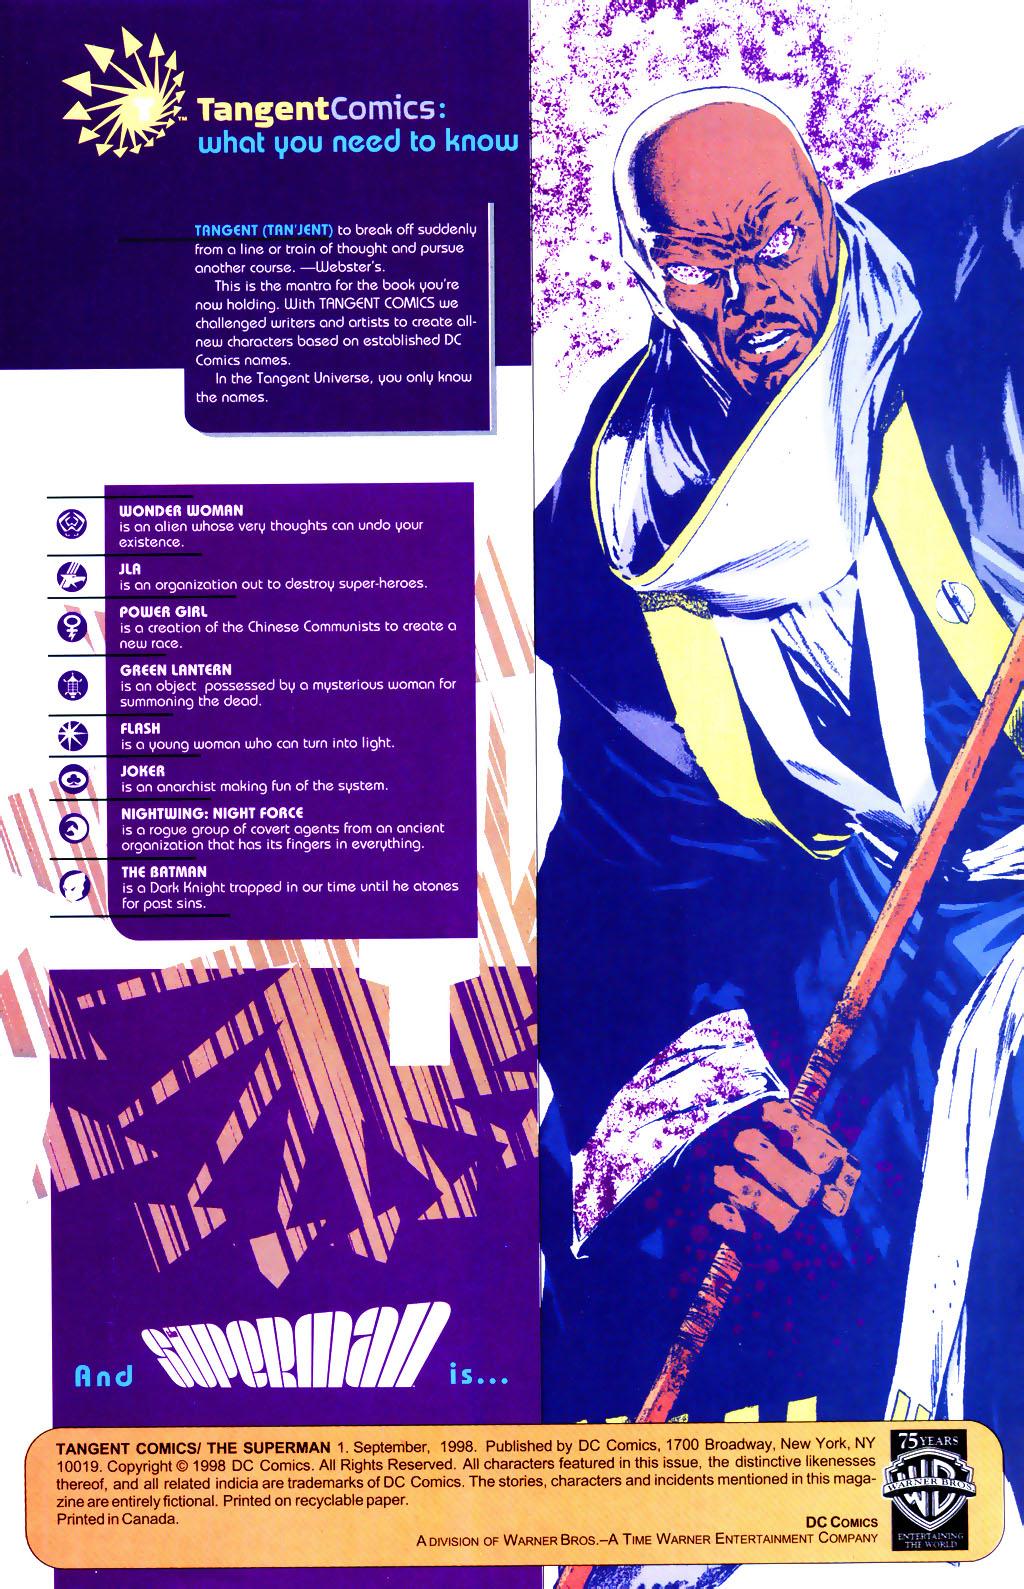 Read online Tangent Comics/ The Superman comic -  Issue # Full - 2